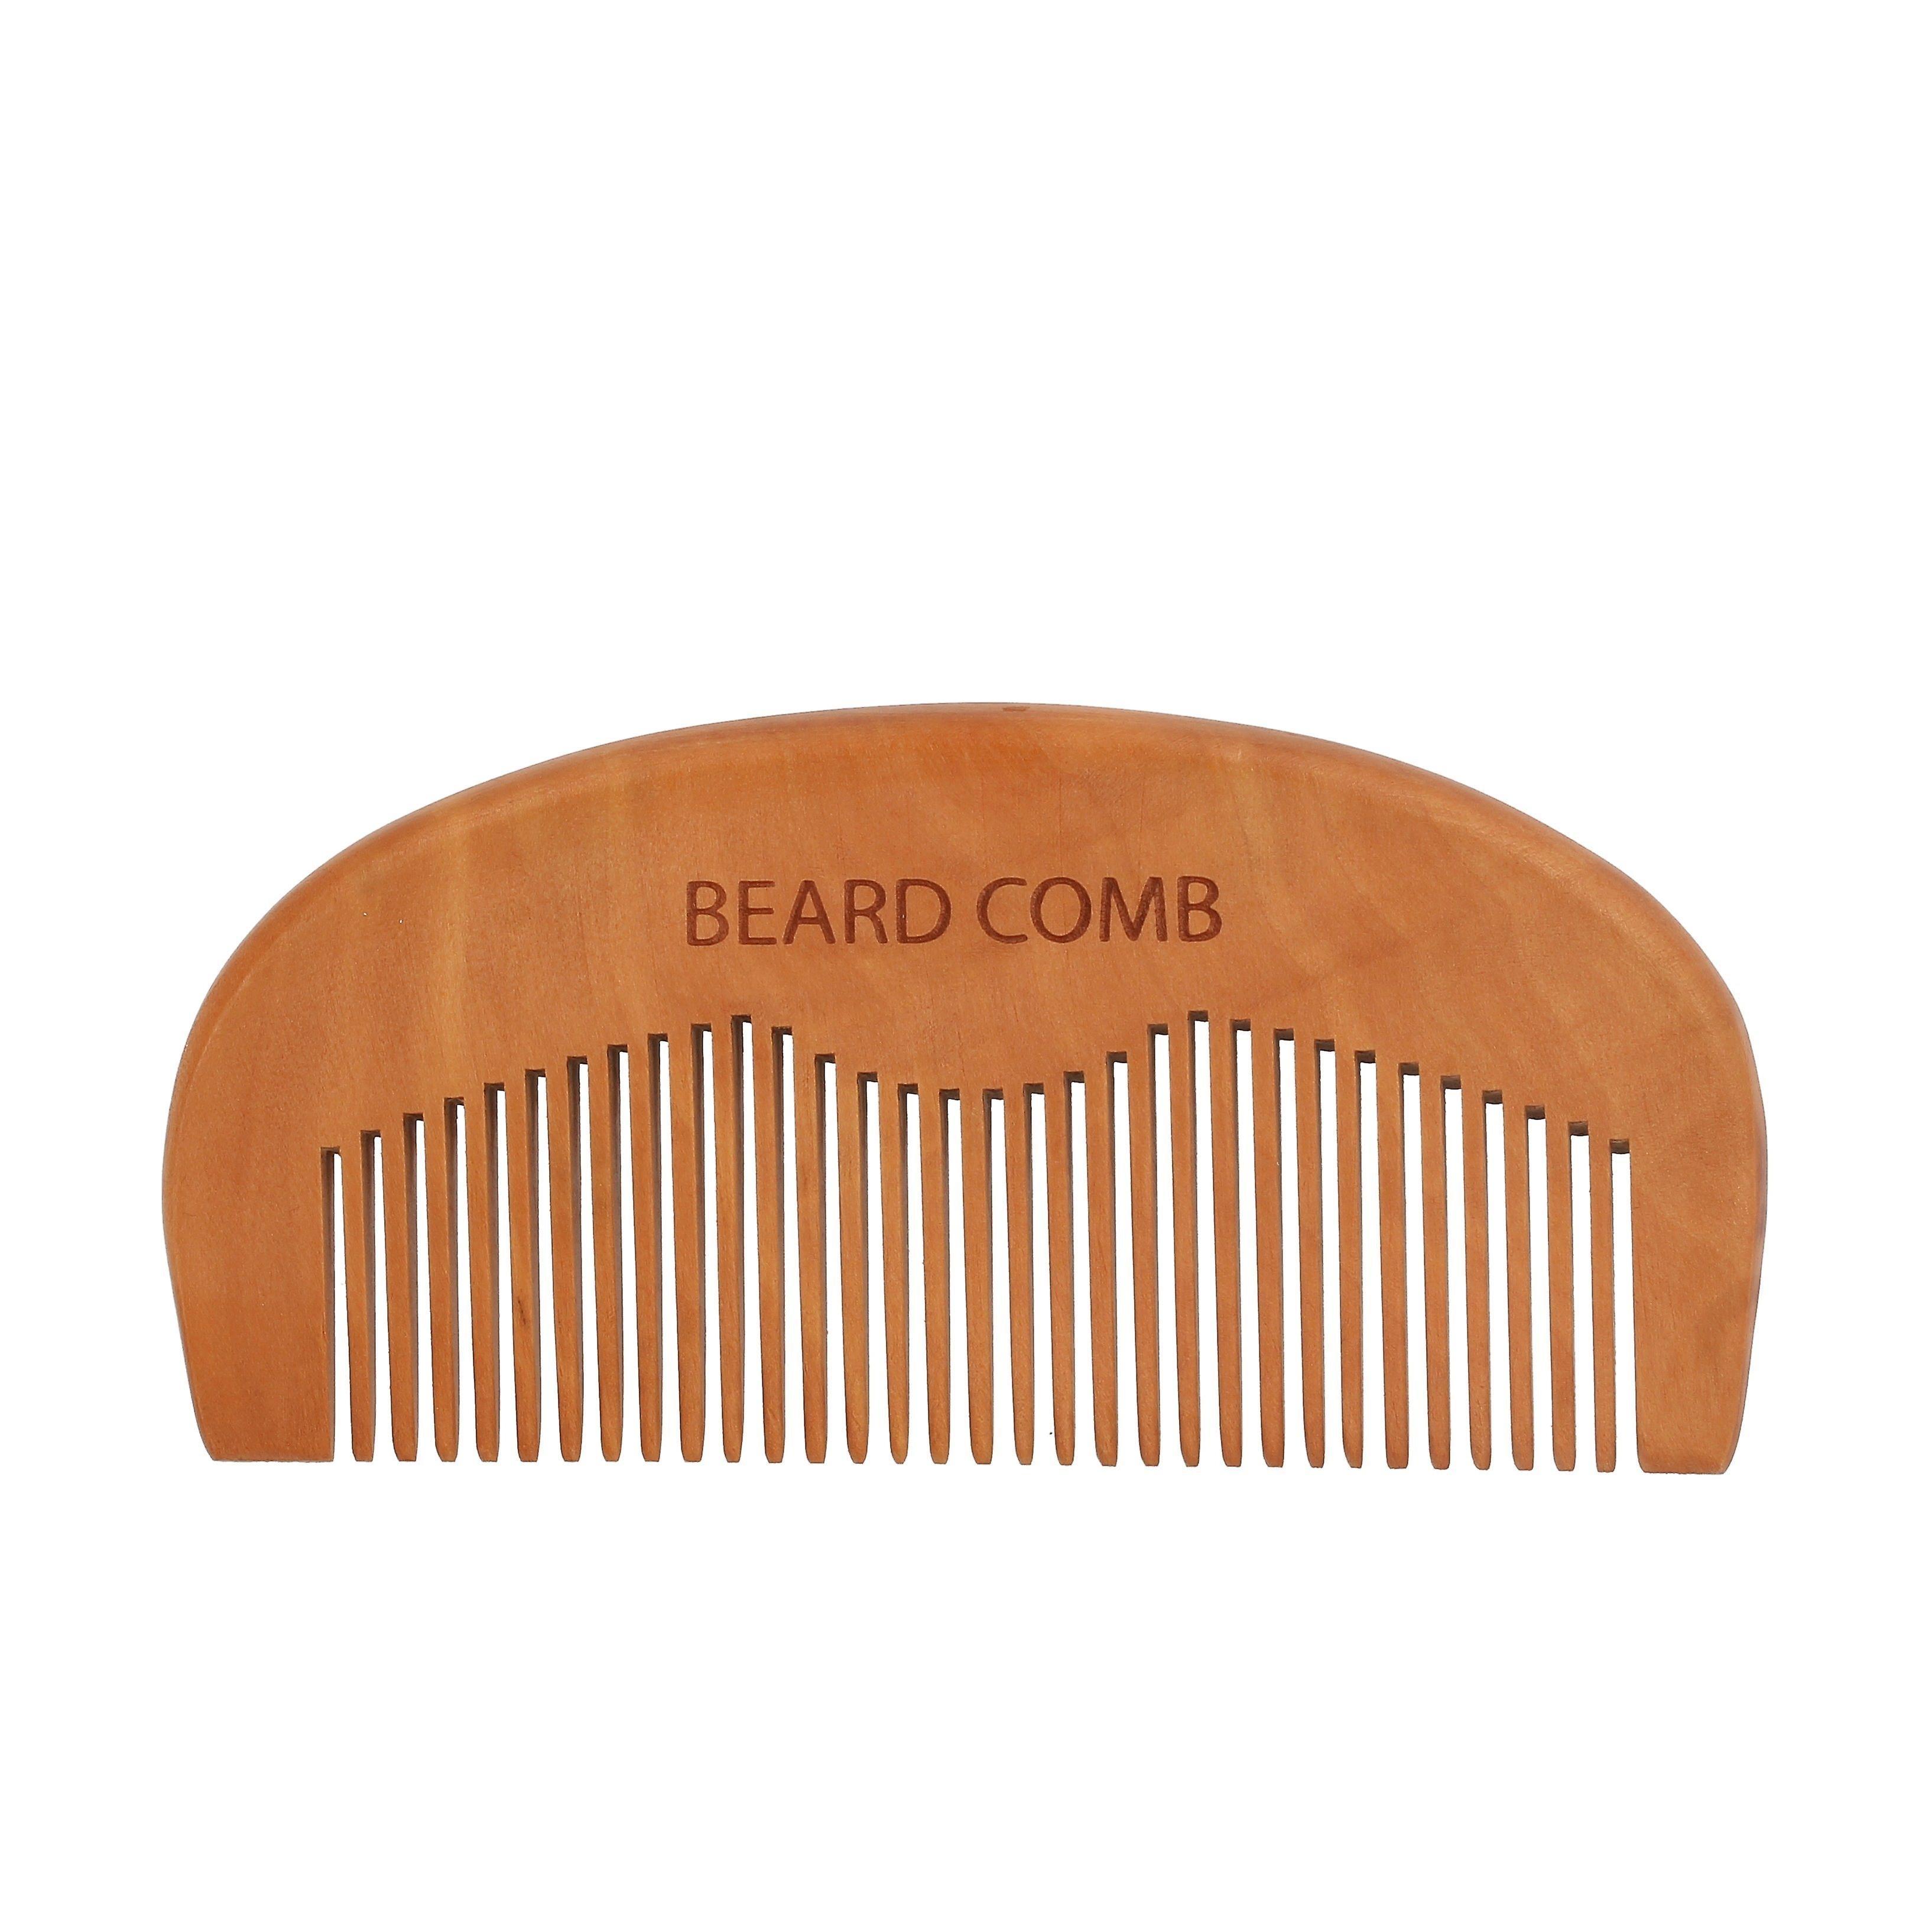 Wooden beard comb